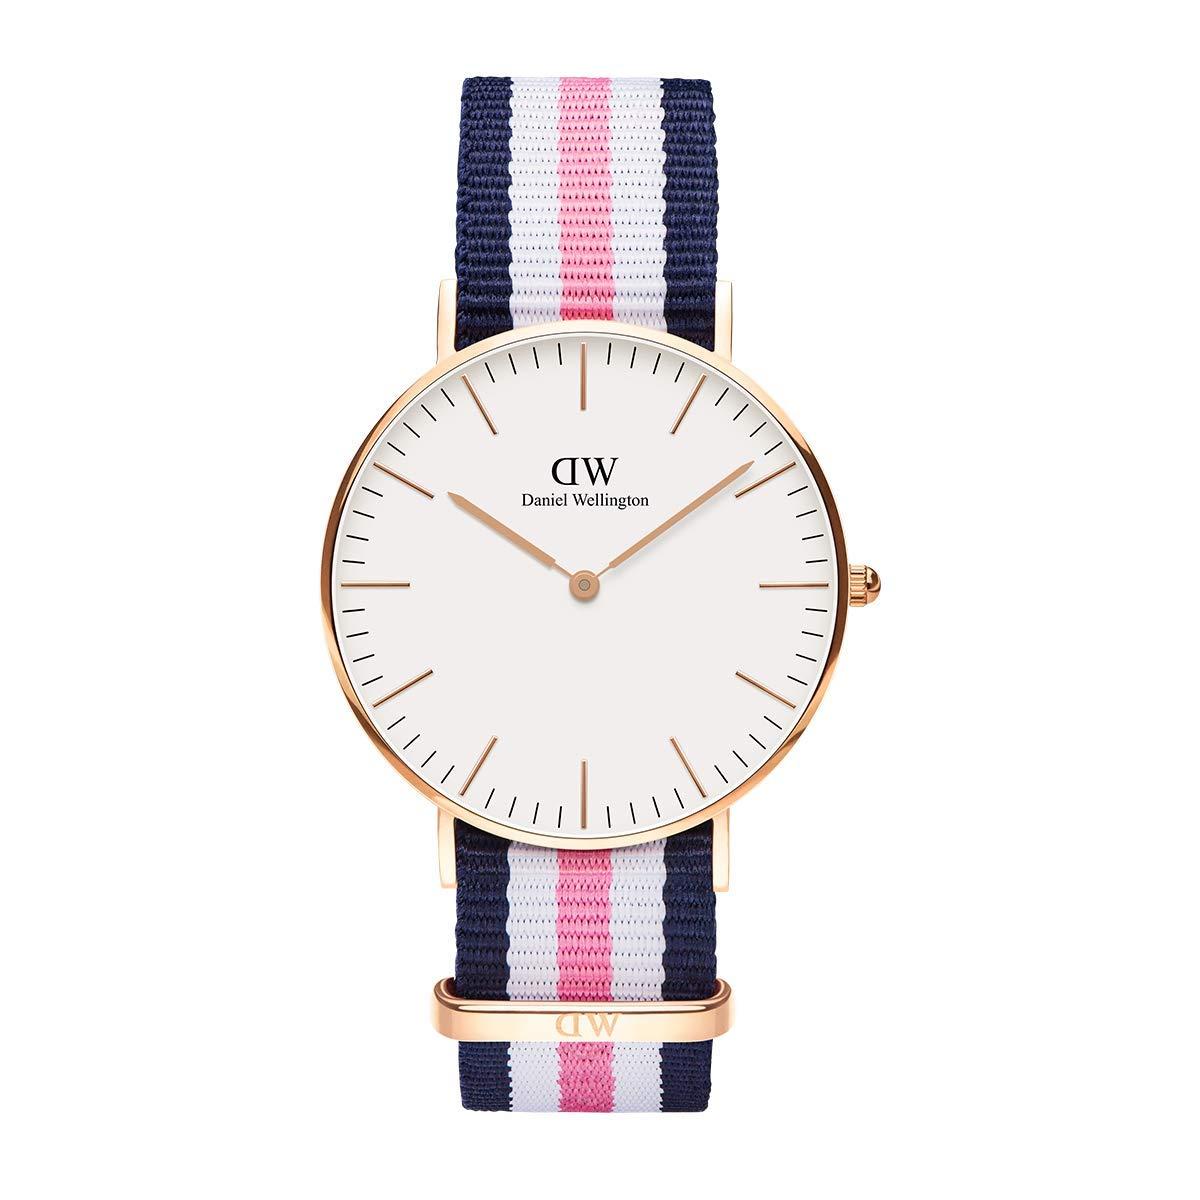 Daniel Wellington Trenduhren  Classic Southampton, Blau-rosa-weiß/Roségold Uhr, 36mm, NATO, für Damen und Herren